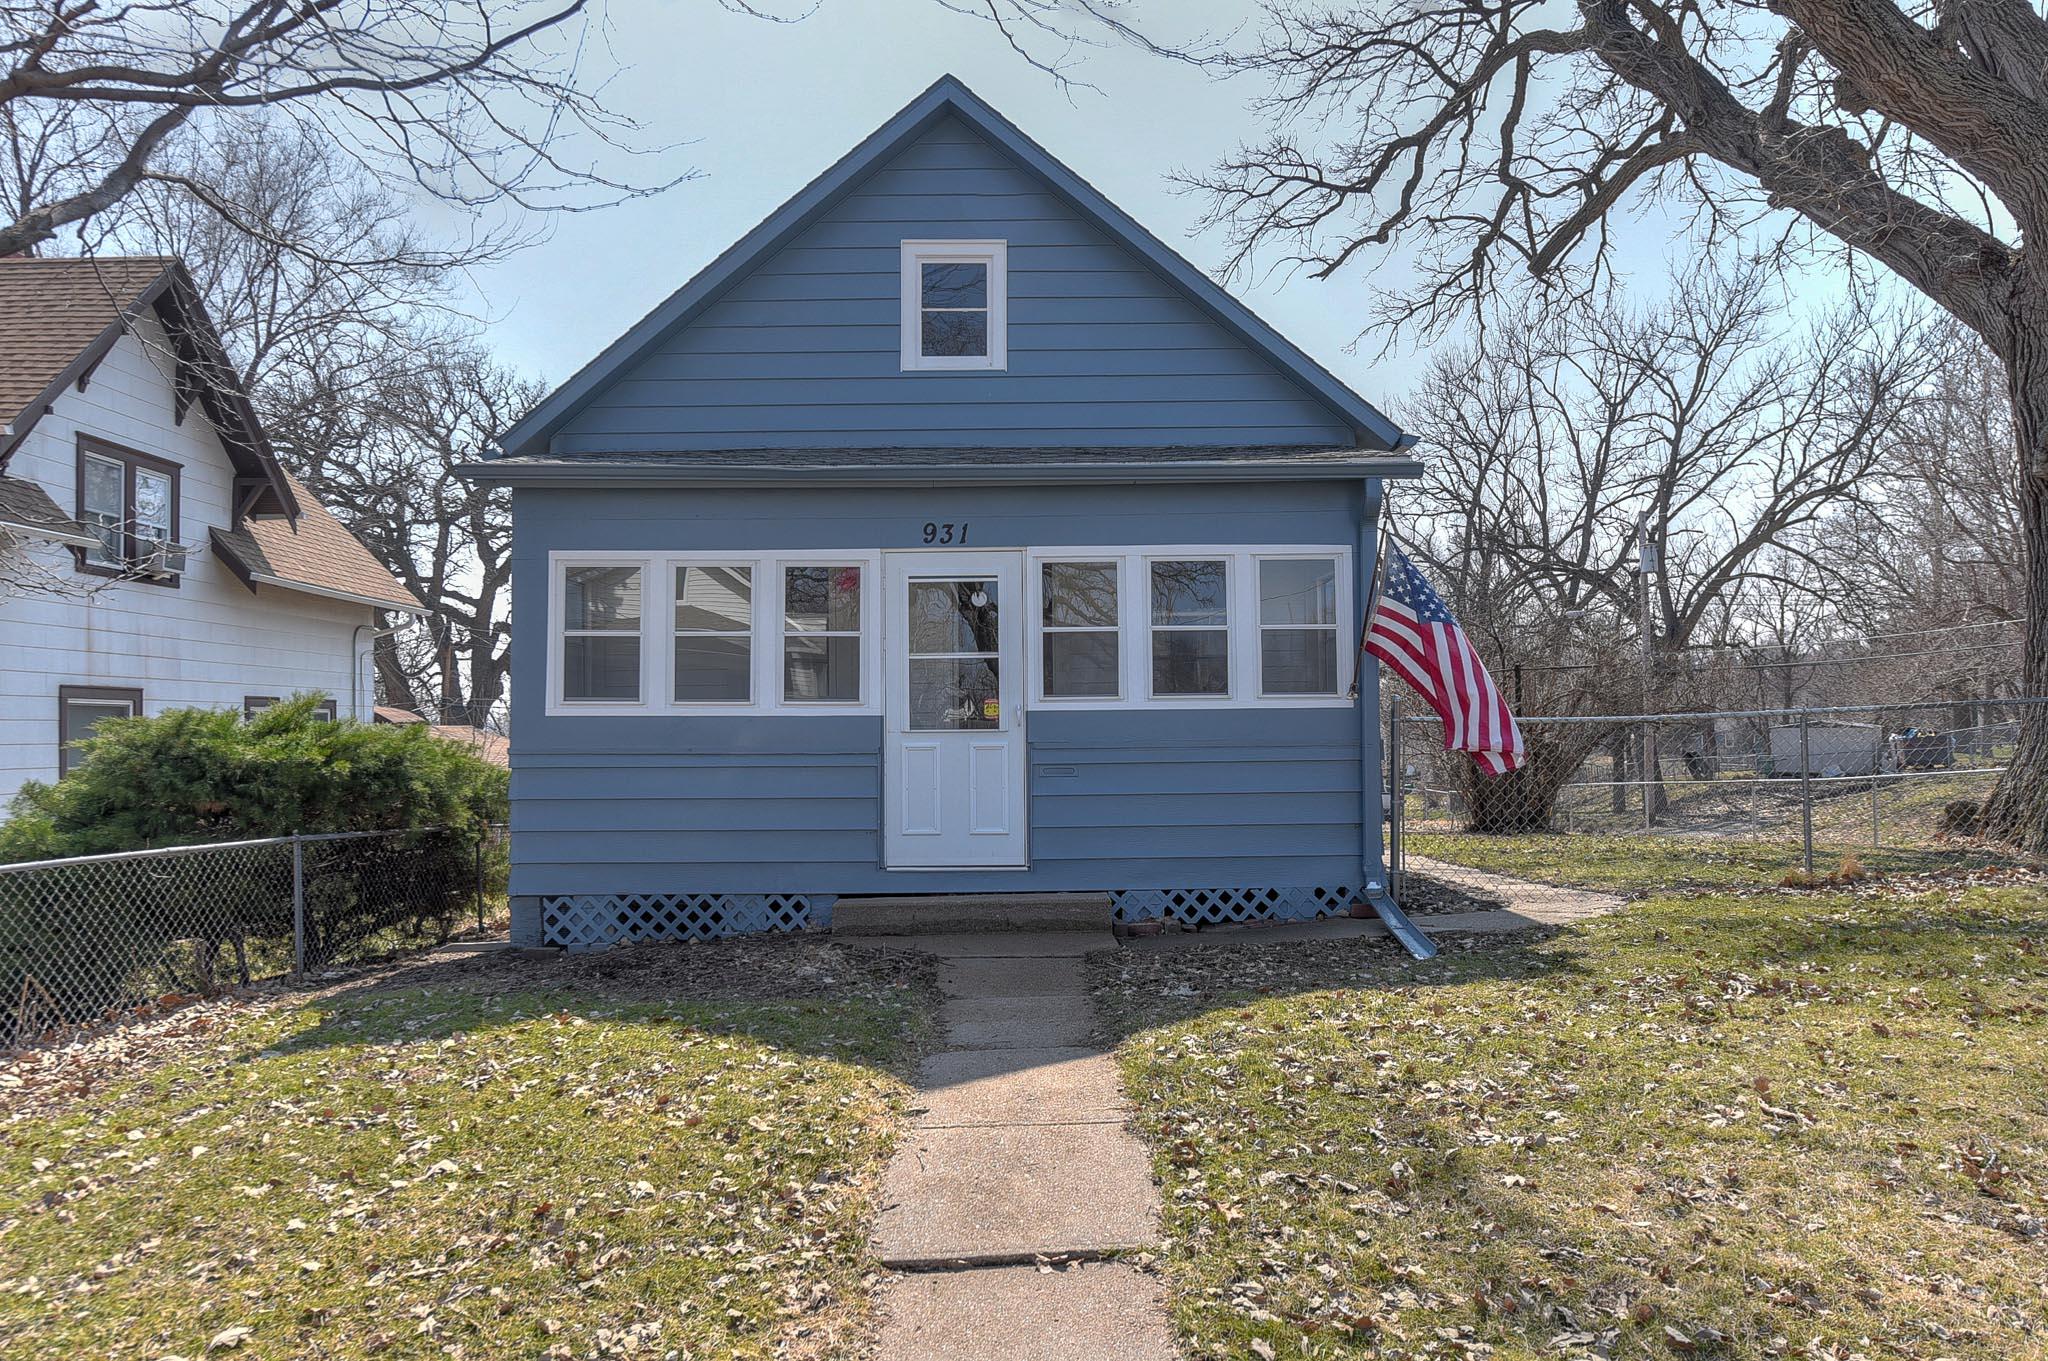 931 Homer Street Omaha, NE 68107